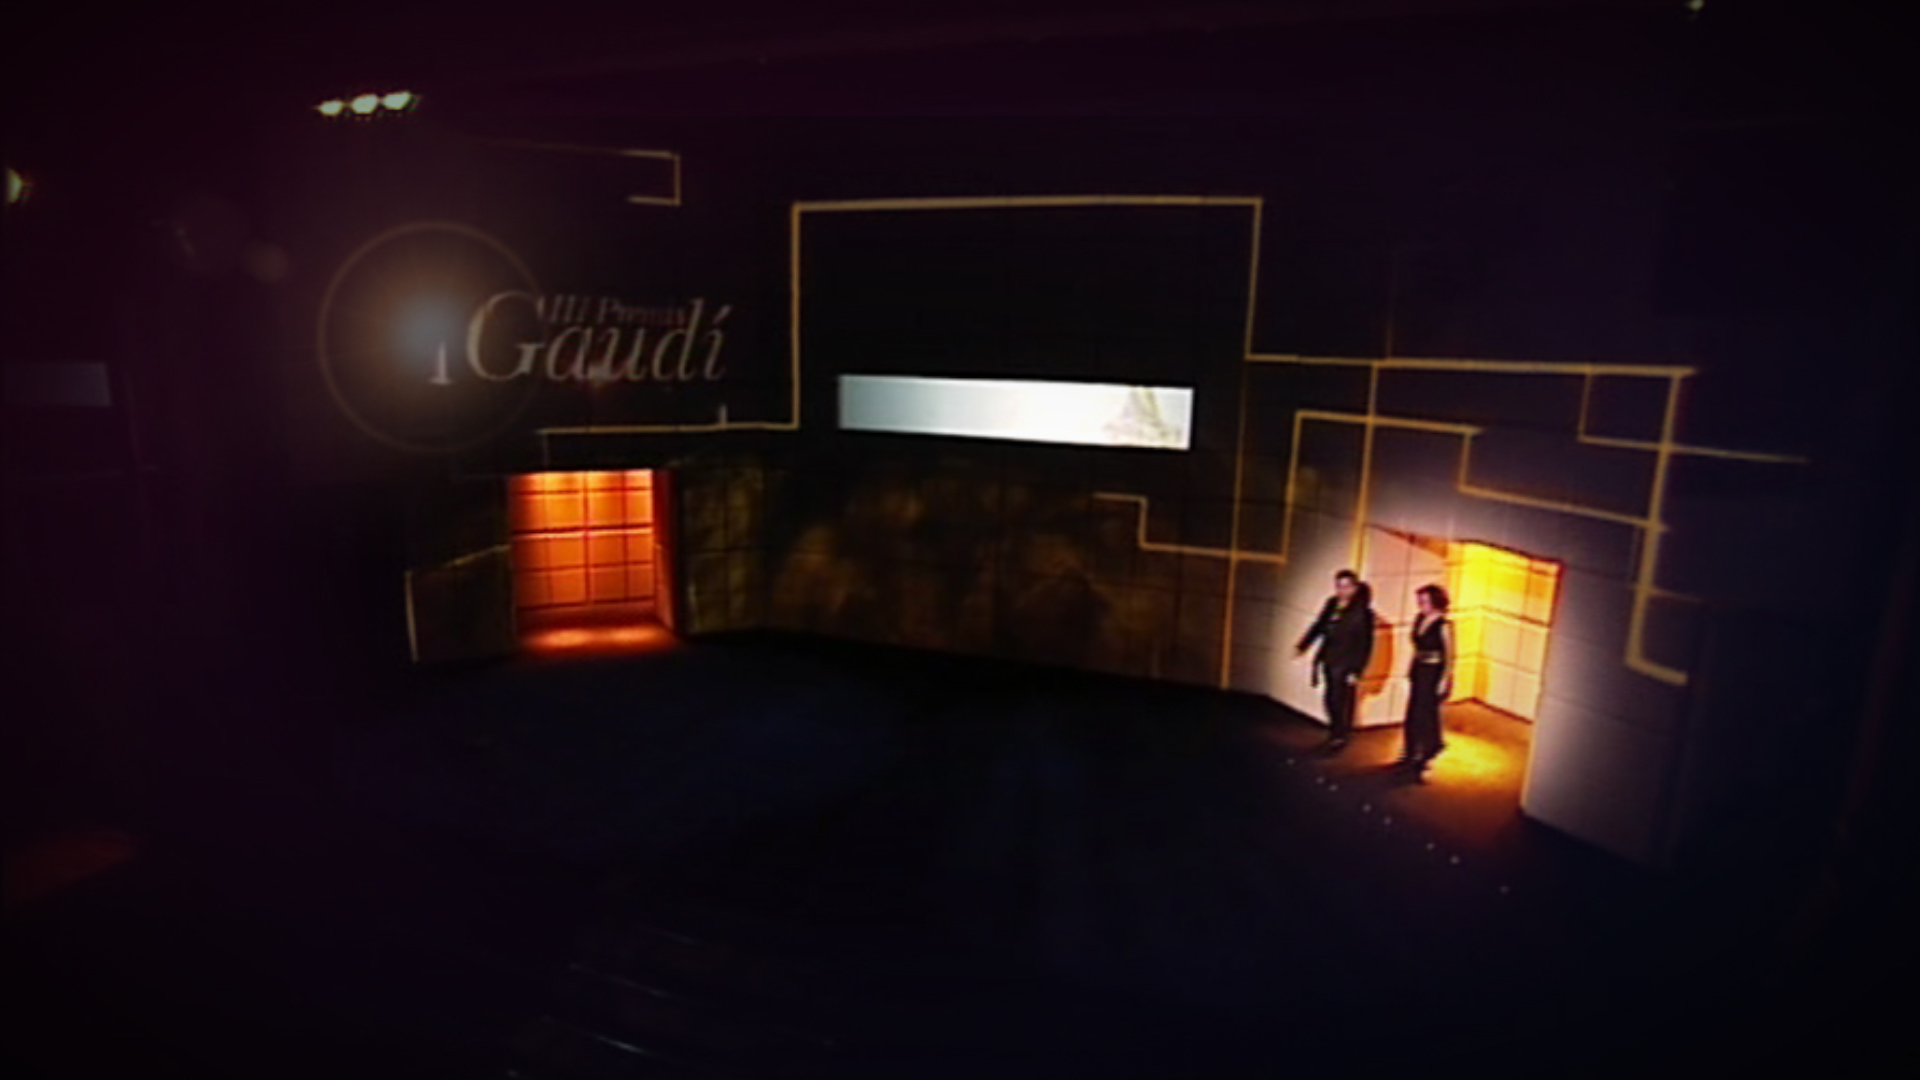 gaudí awards video mapping